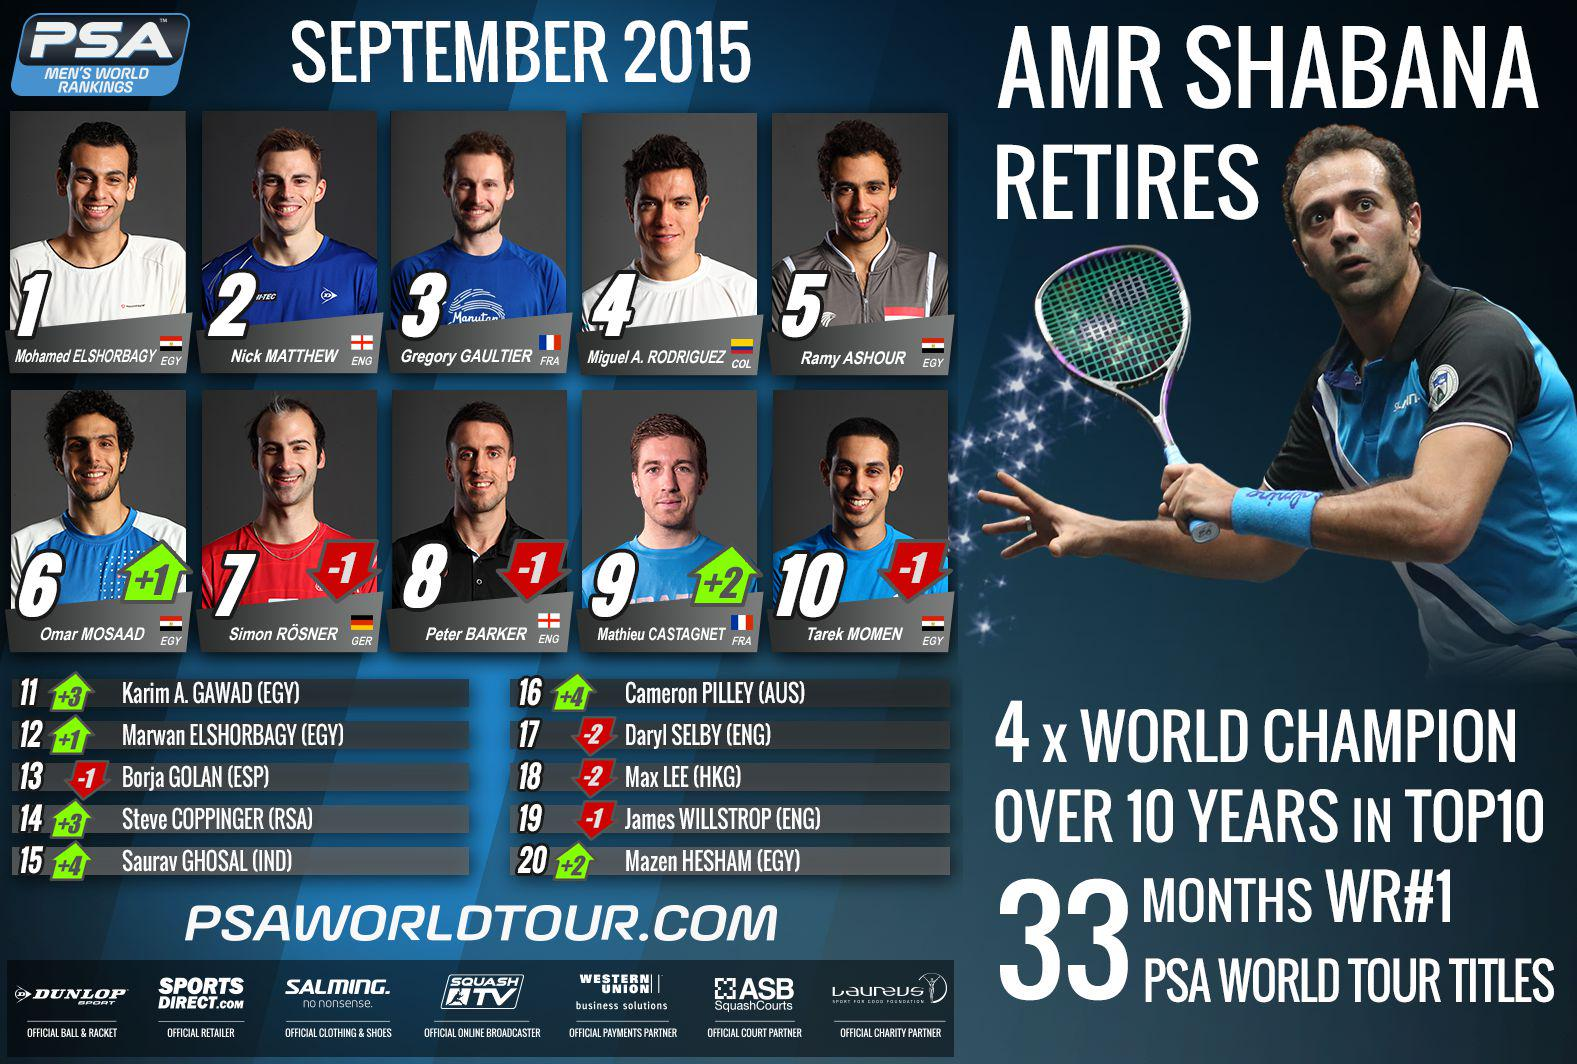 Rankings: @SauravGhosal @campilley @copssquash @karimsammy & @mazsabry also up in full September rankings #squash http://t.co/cCW7ZpjaUB